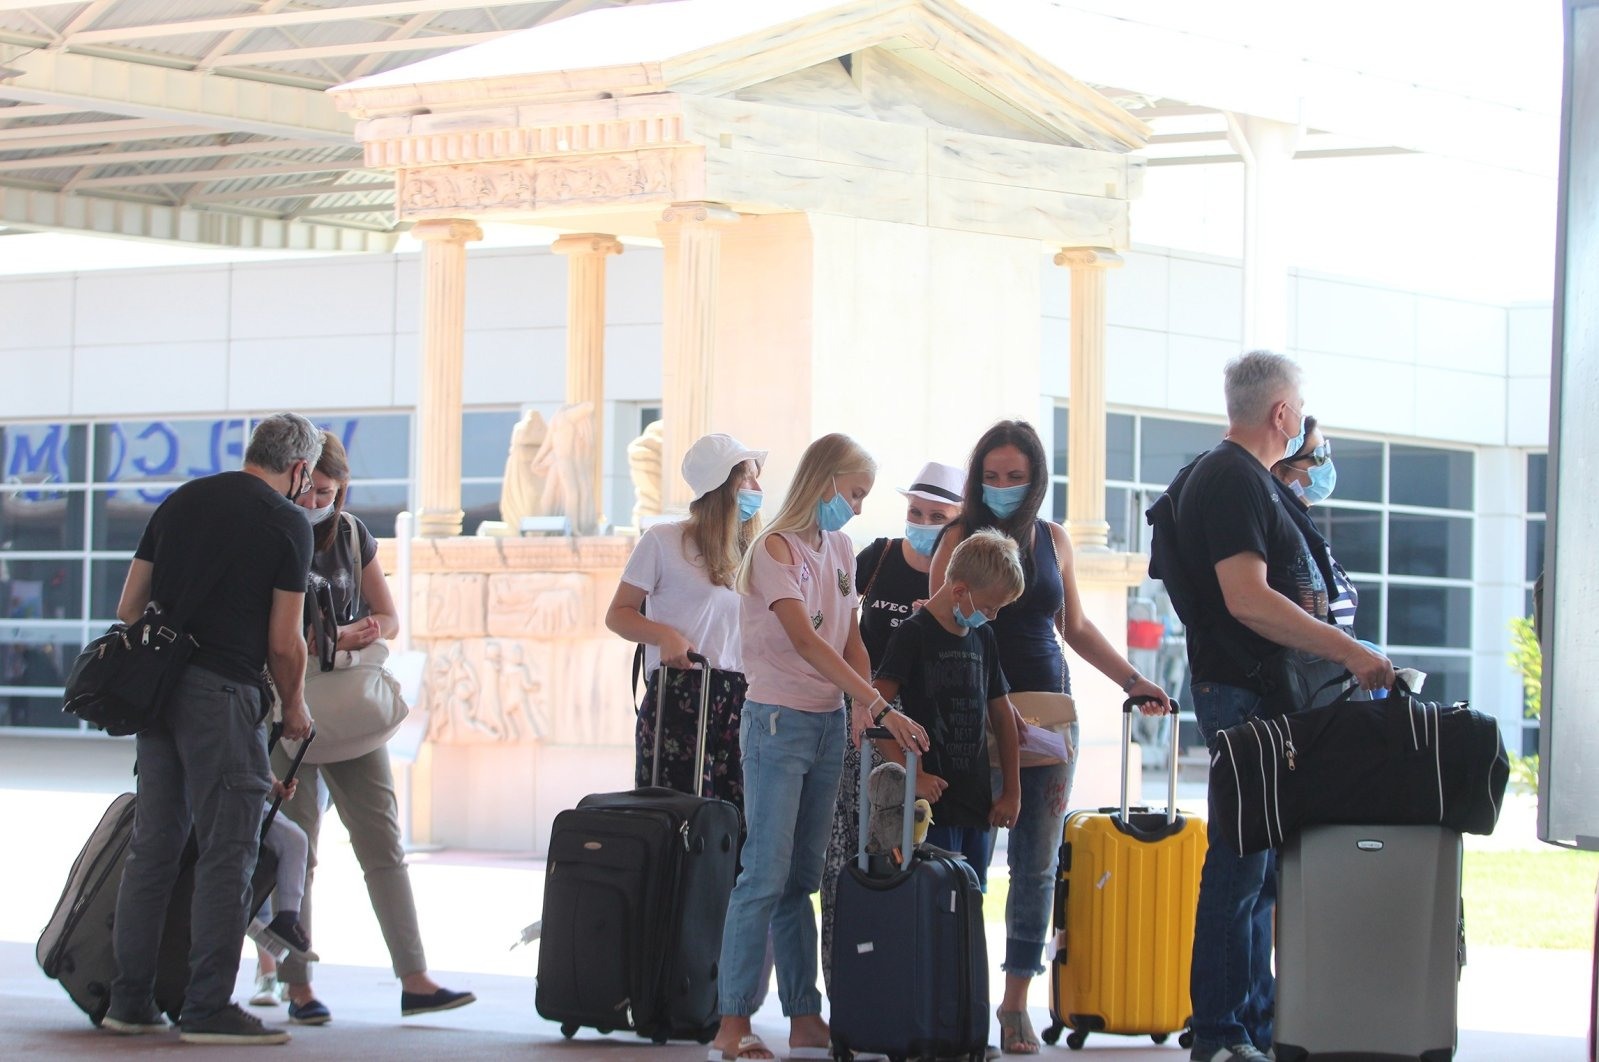 Russian tourists arrive at Antalya Airport, Antalya province, southern Turkey, July 10, 2020. (IHA Photo)